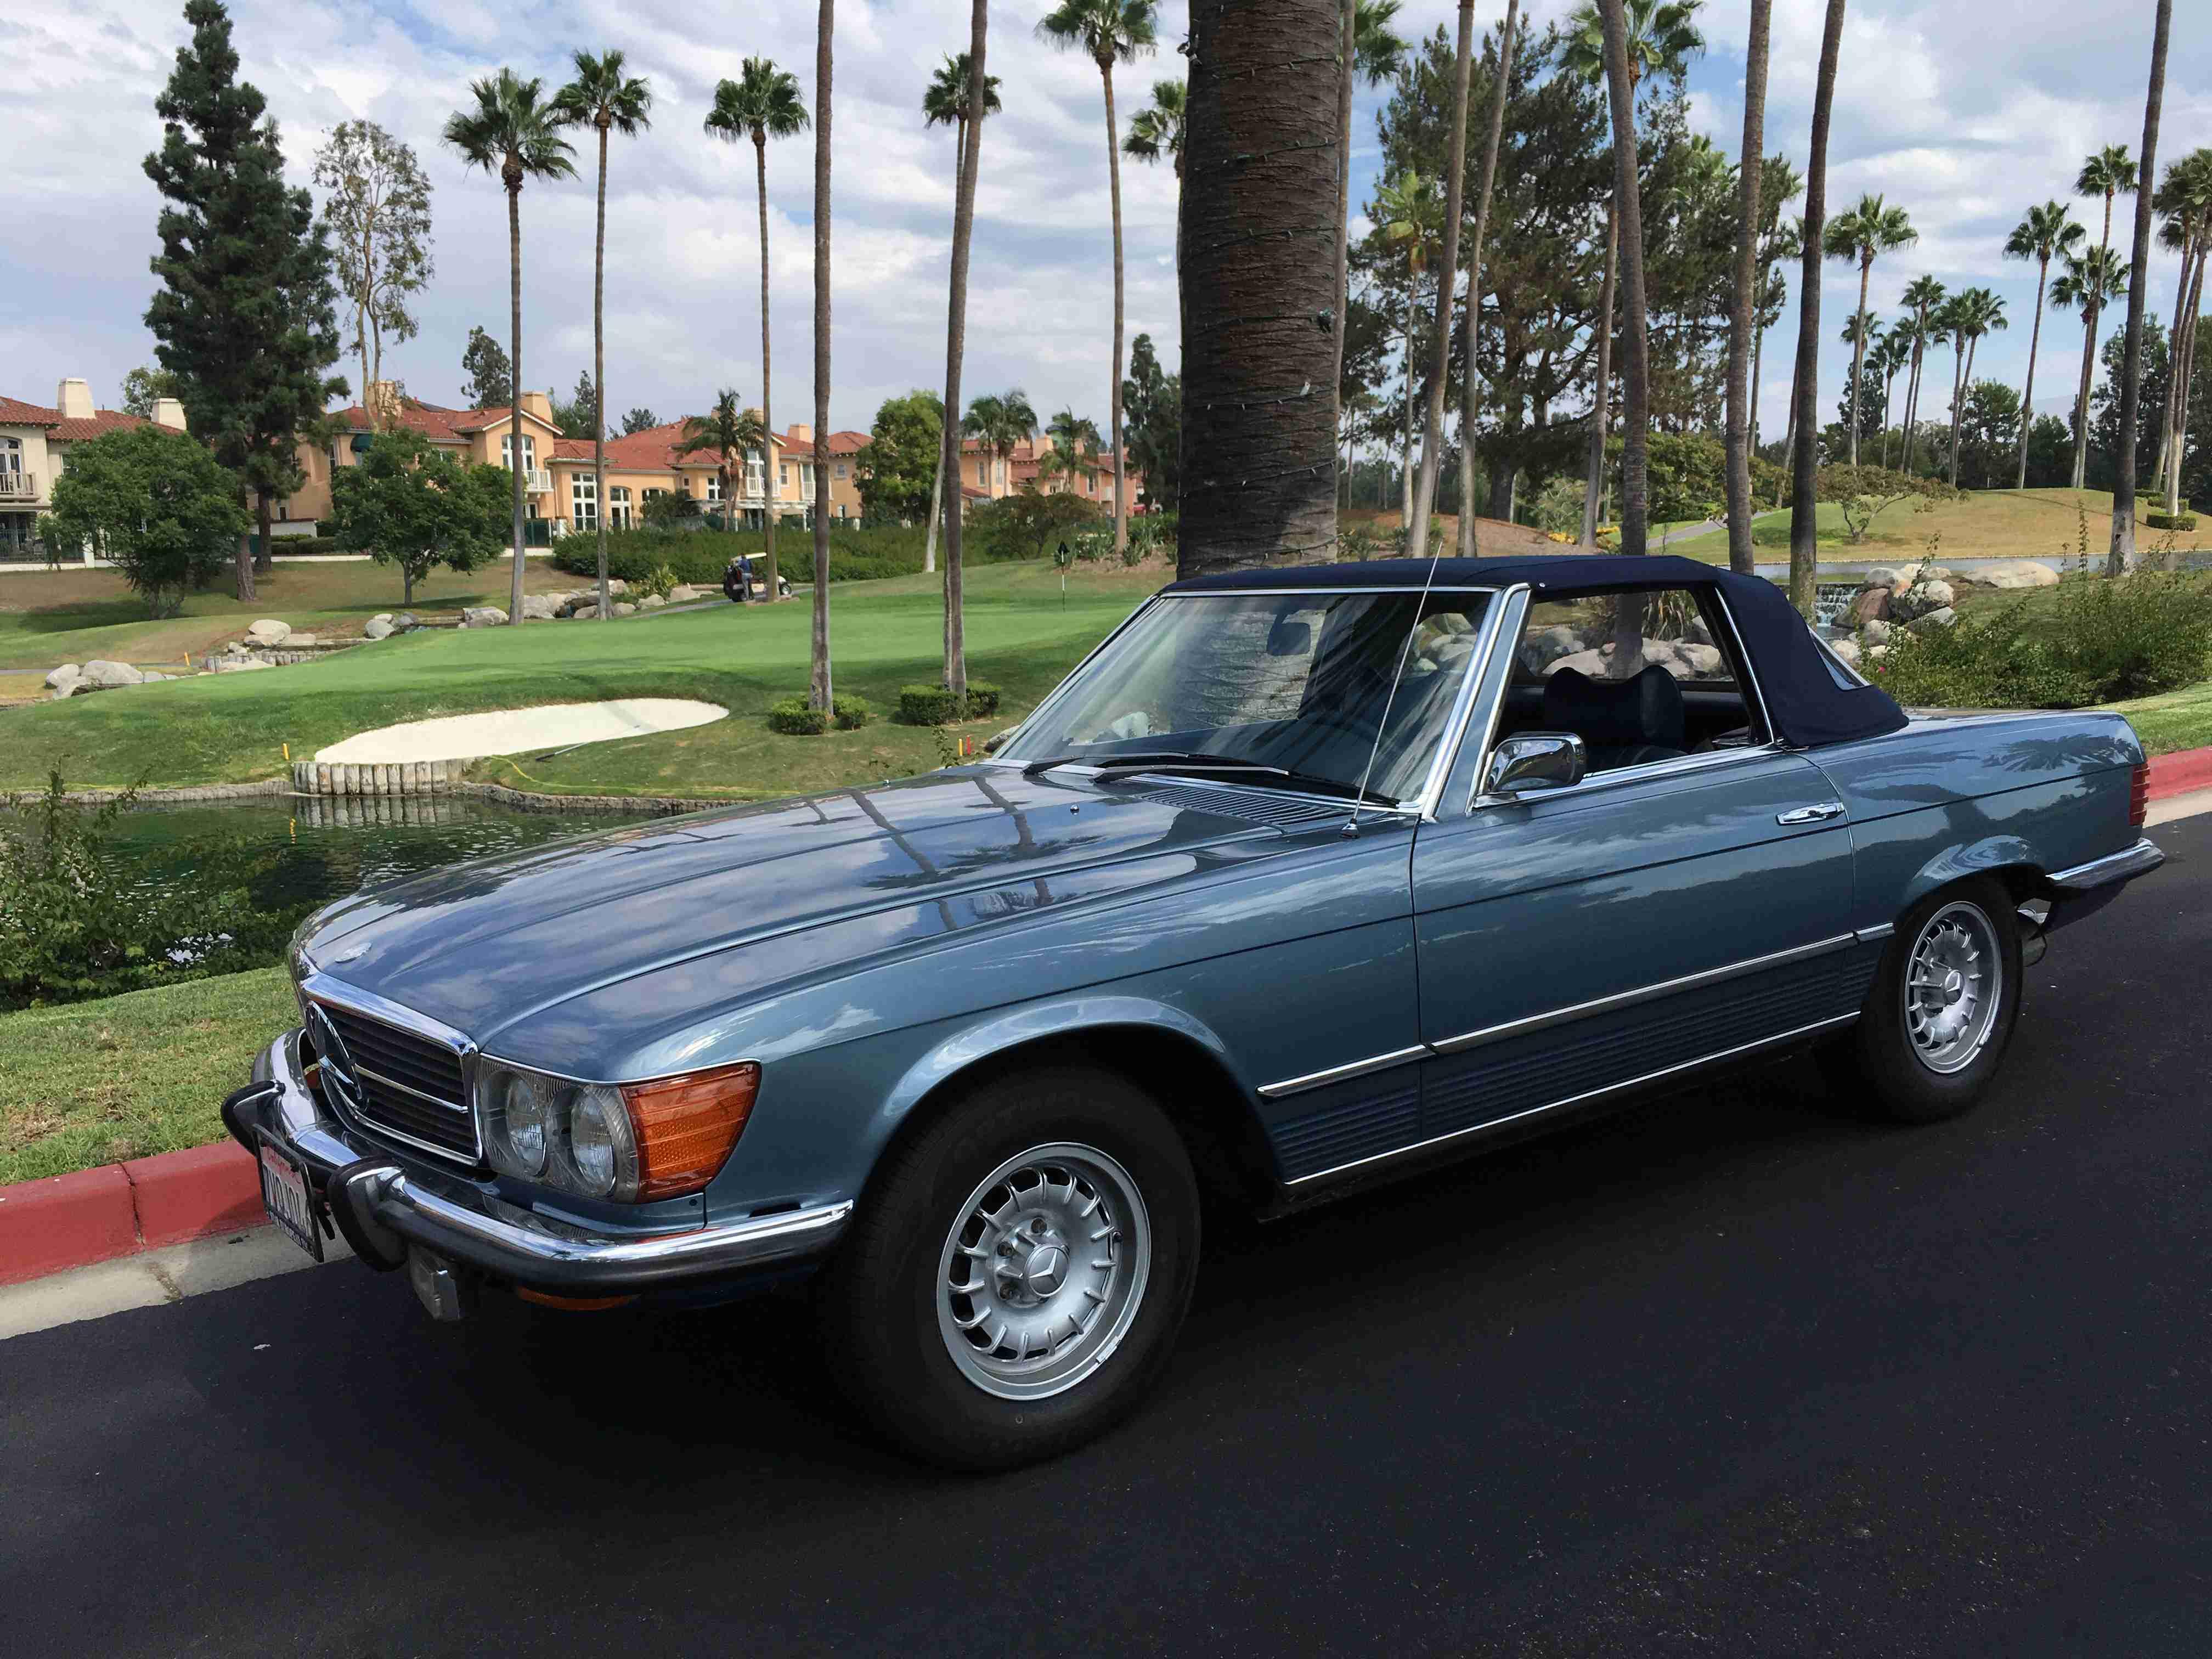 1973 Mercedes 450SL - € RESERVIERT US RESERVED